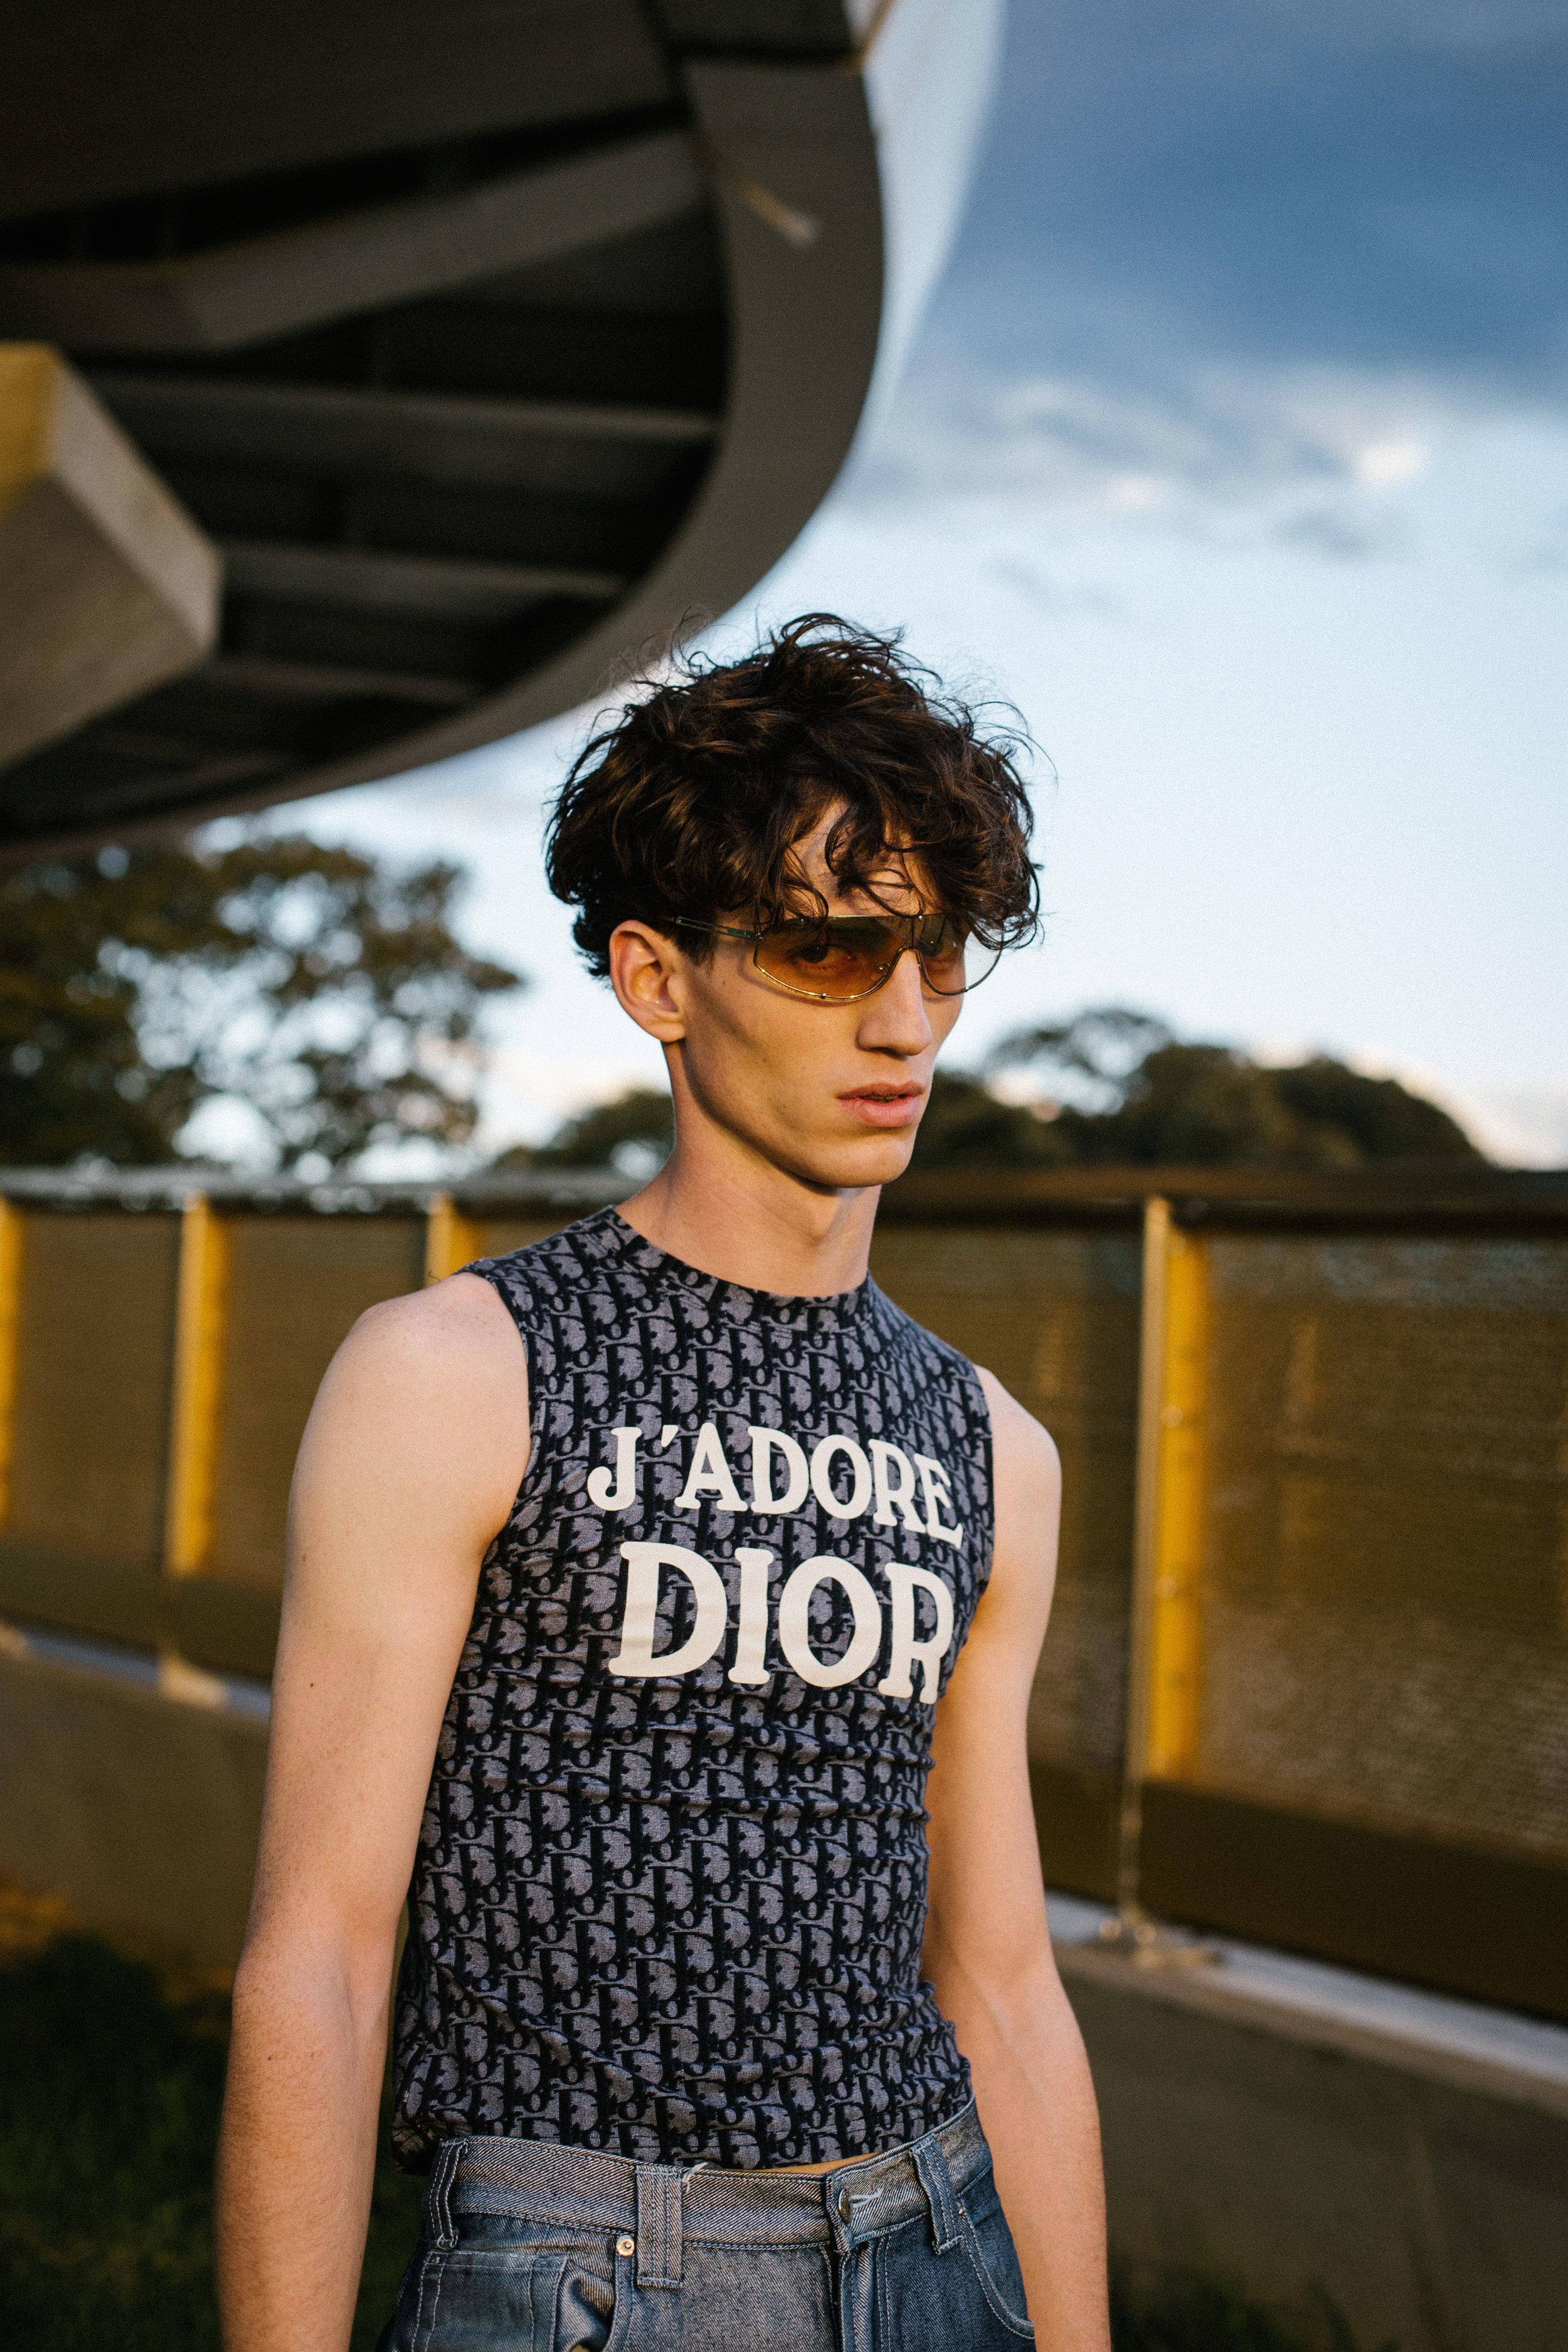 sunglasses Dior, top Dior, jeans Dada, shoes Maison Martin Margiela